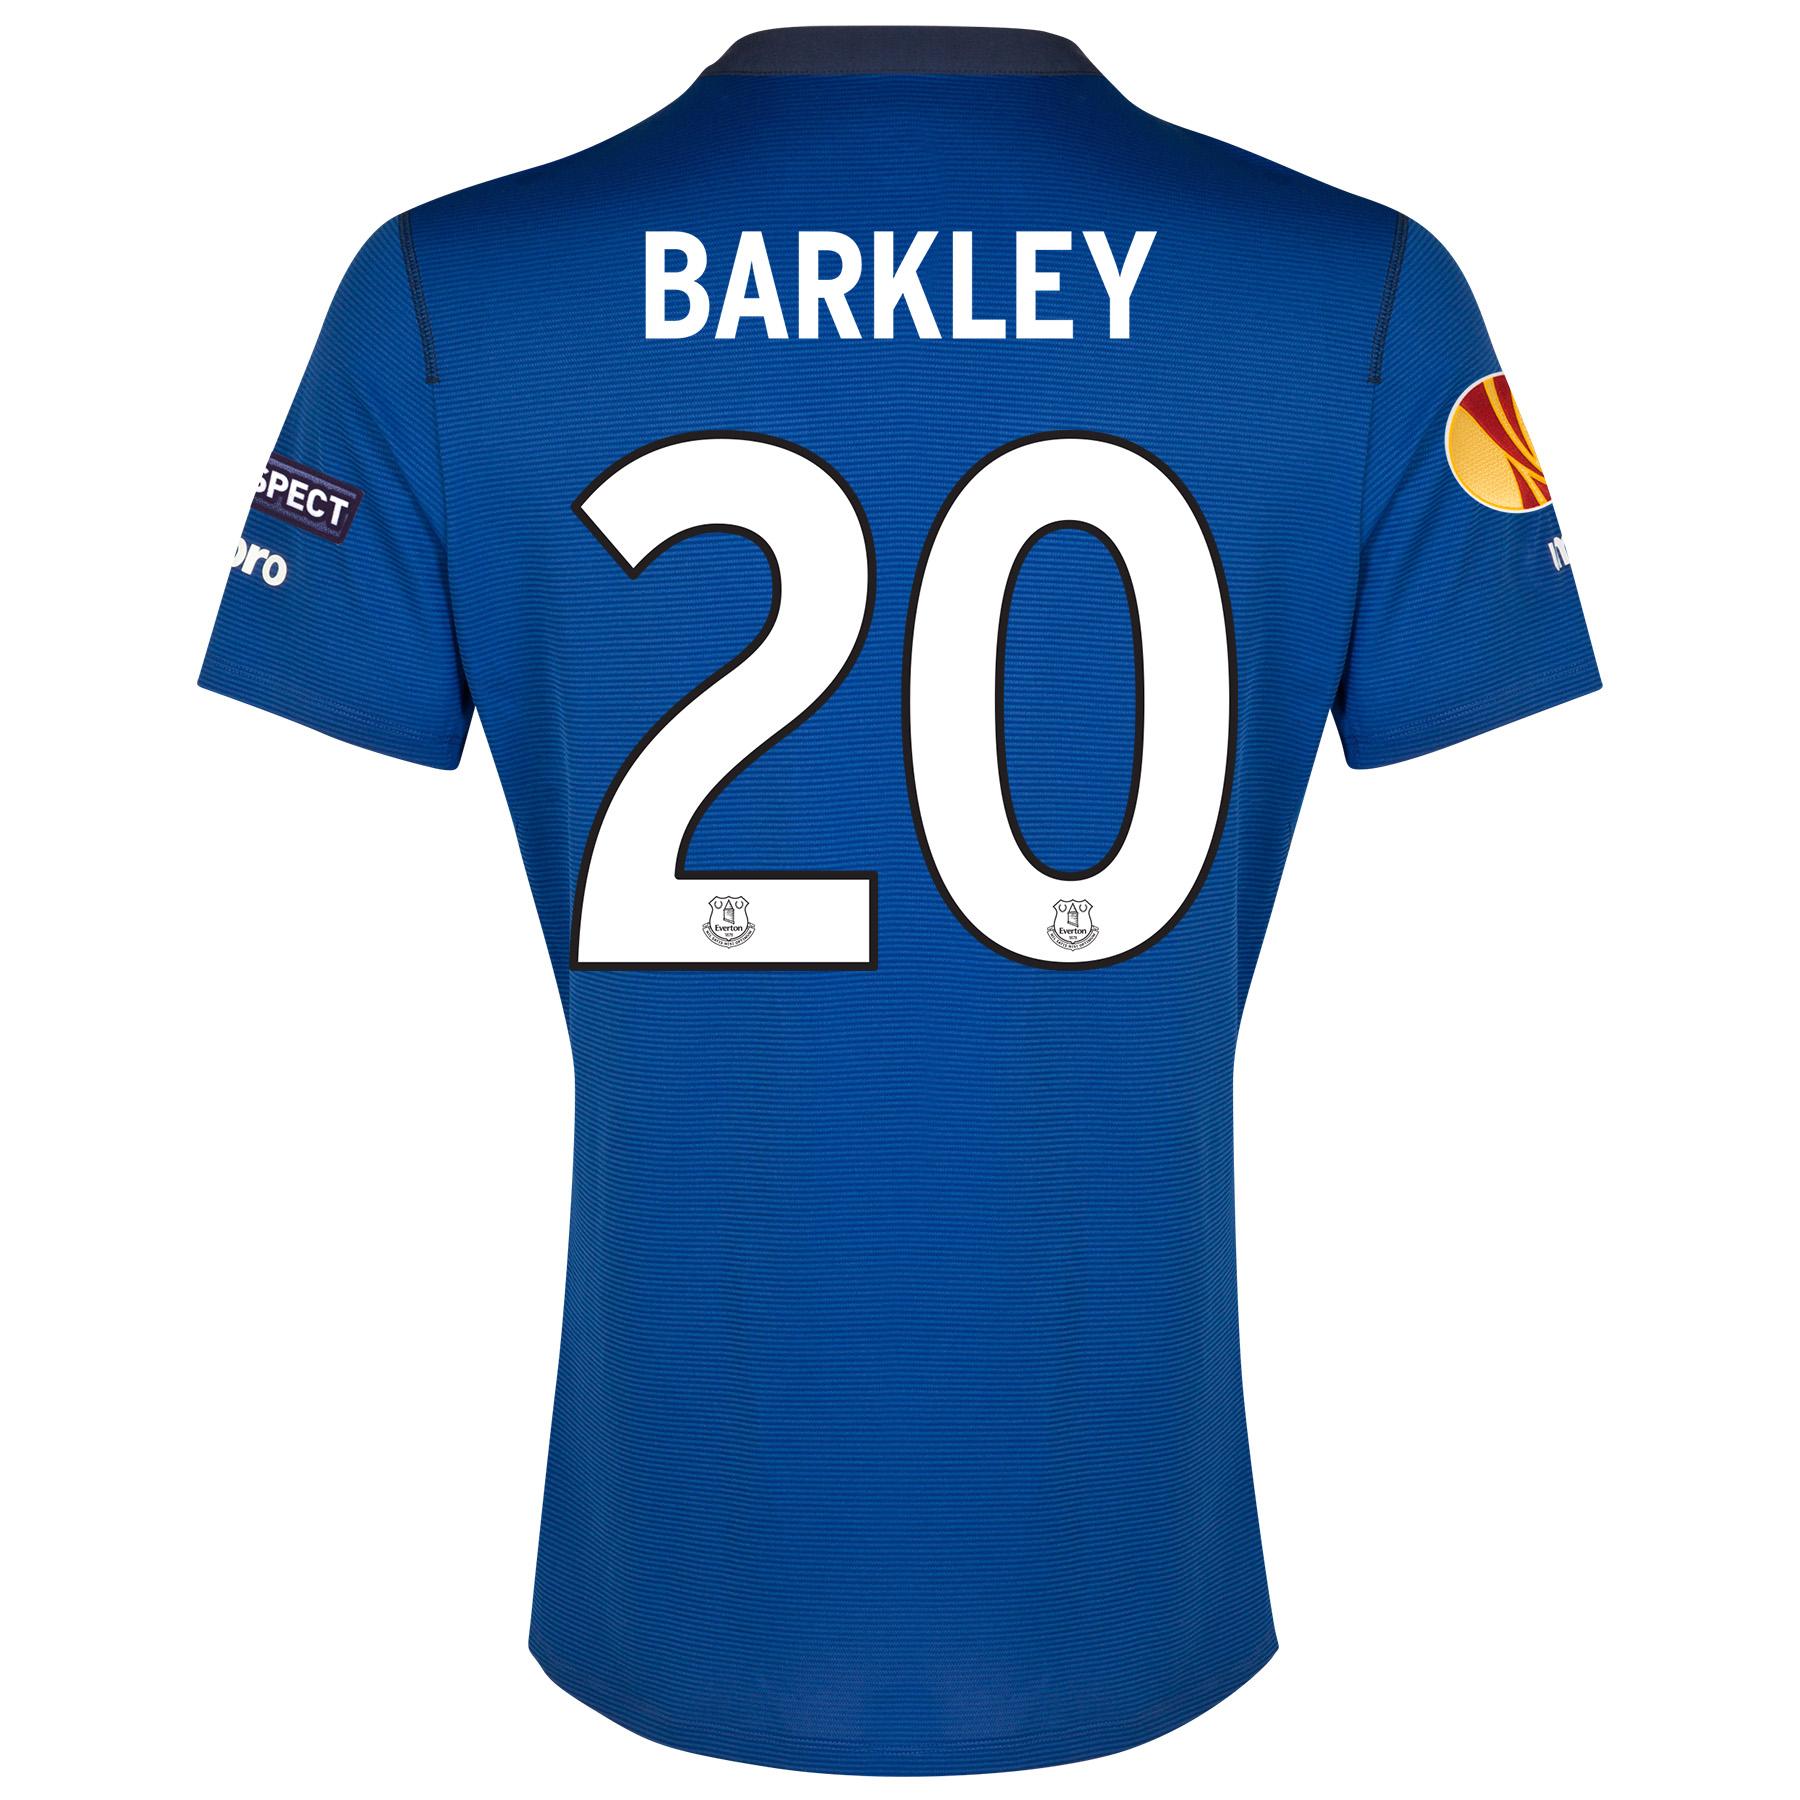 Everton UEFA Europa League Home Shirt 2014/15 SS - Junior with Barkley 20 printing